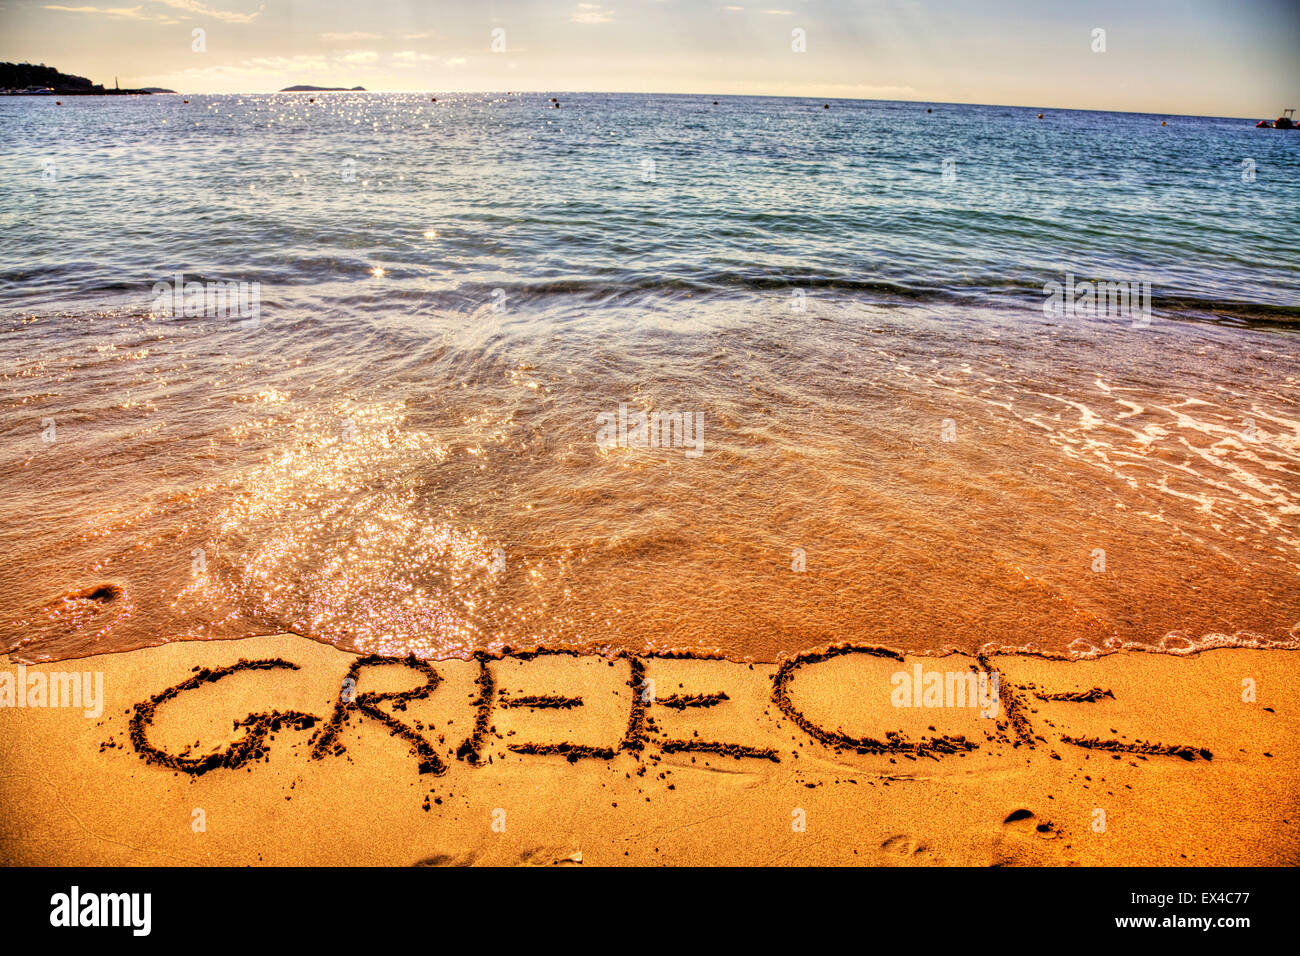 Greece Greek coast coastline metaphor sinking in debt drowning under water word written in sand sea seas coastline - Stock Image